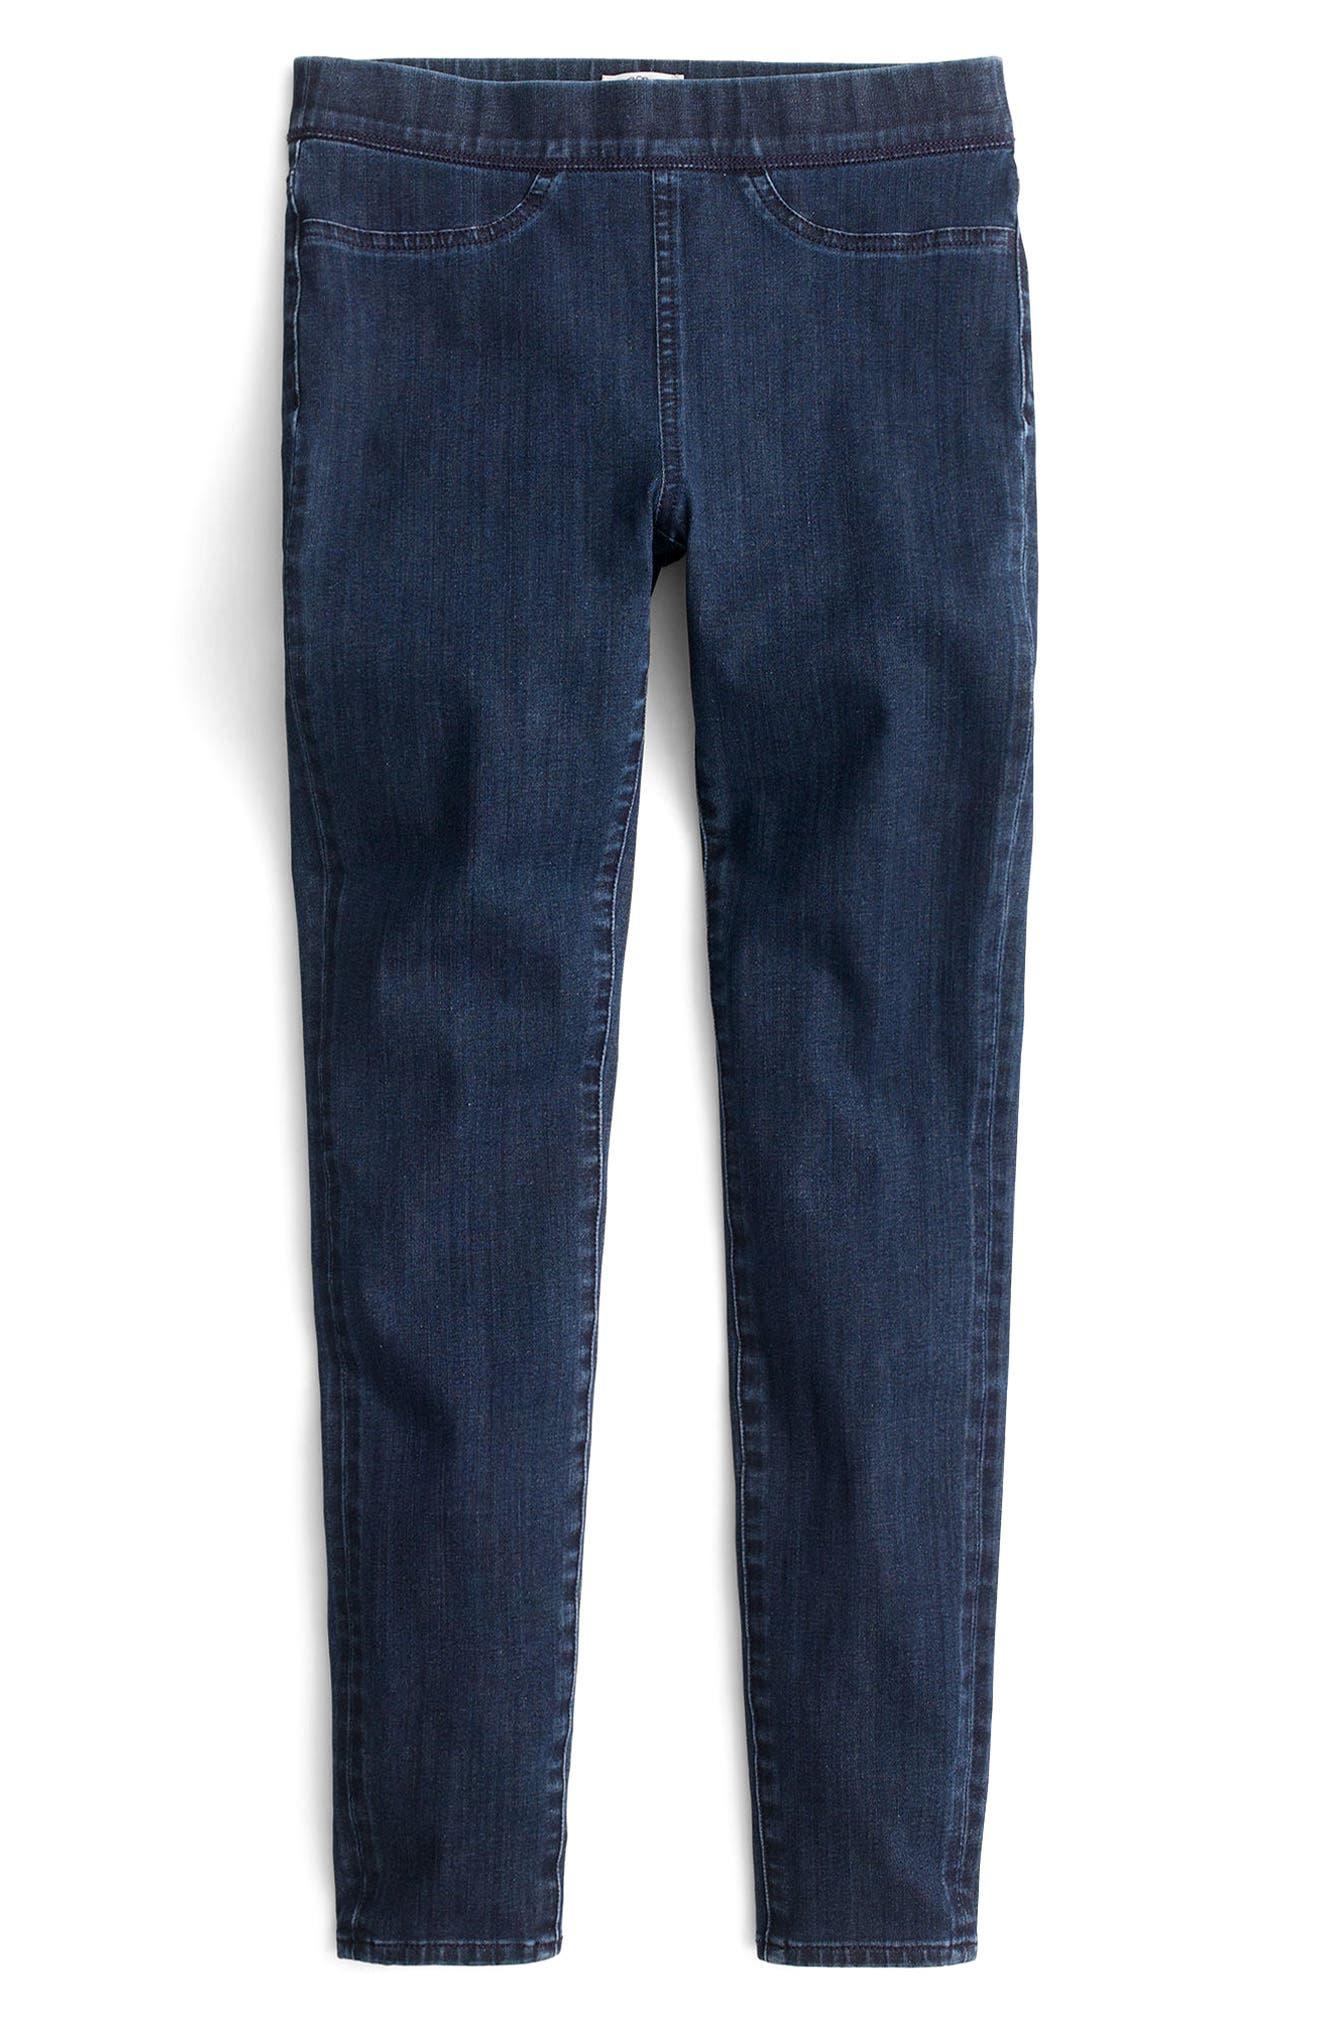 Alternate Image 3  - J.Crew Pull-On Toothpick Indigo Jeans (Regular & Petite)